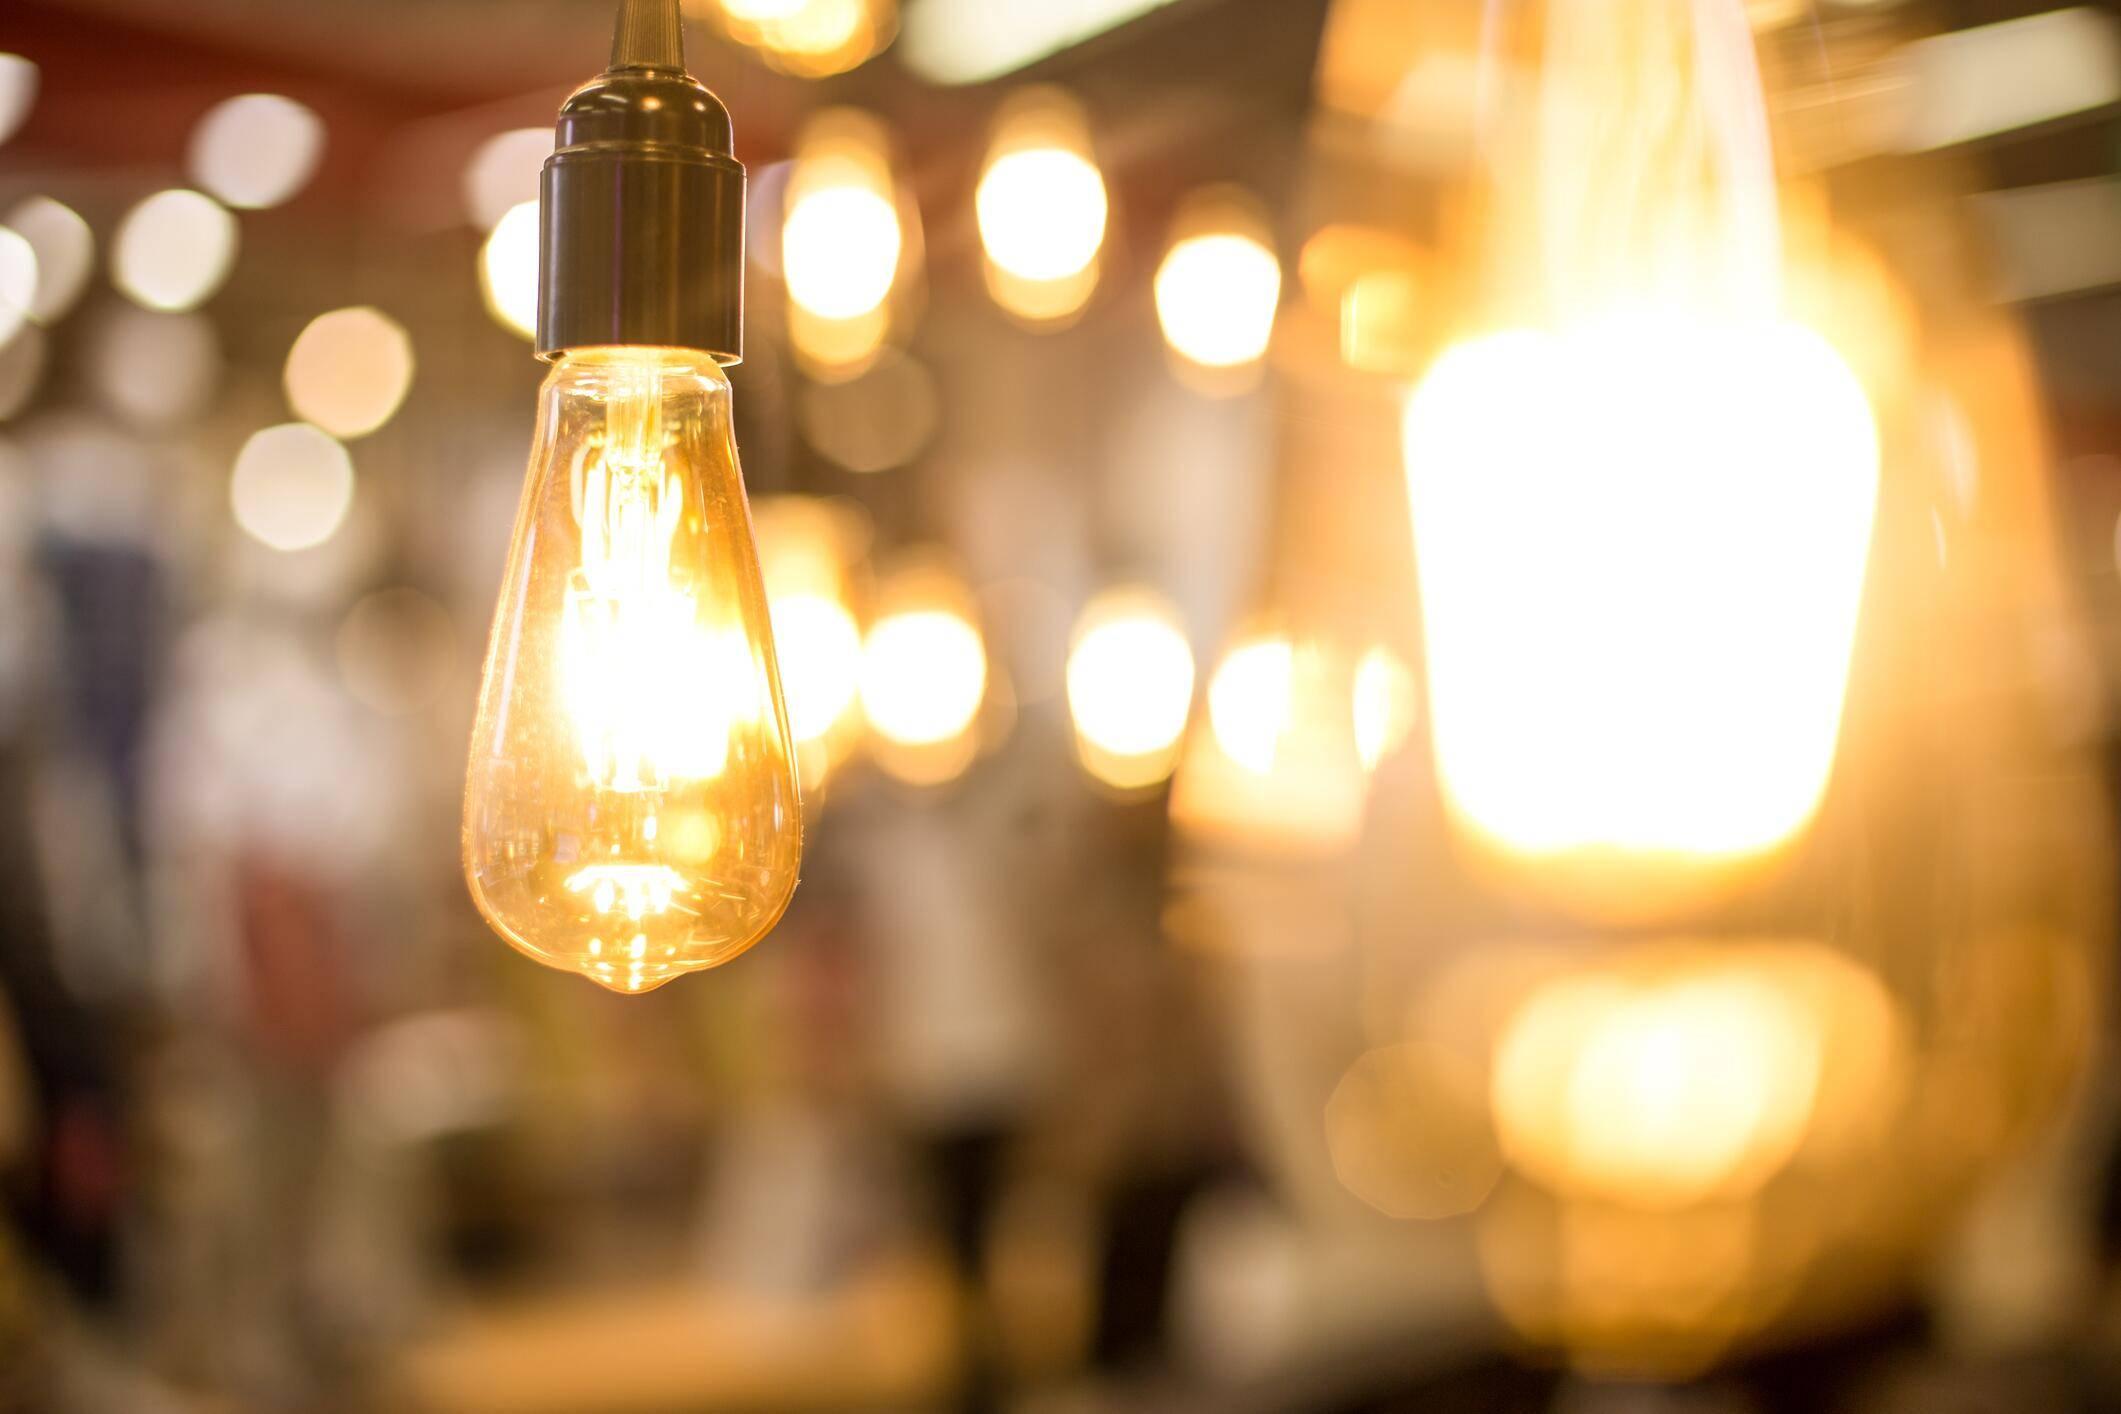 Light bulb penetration #13